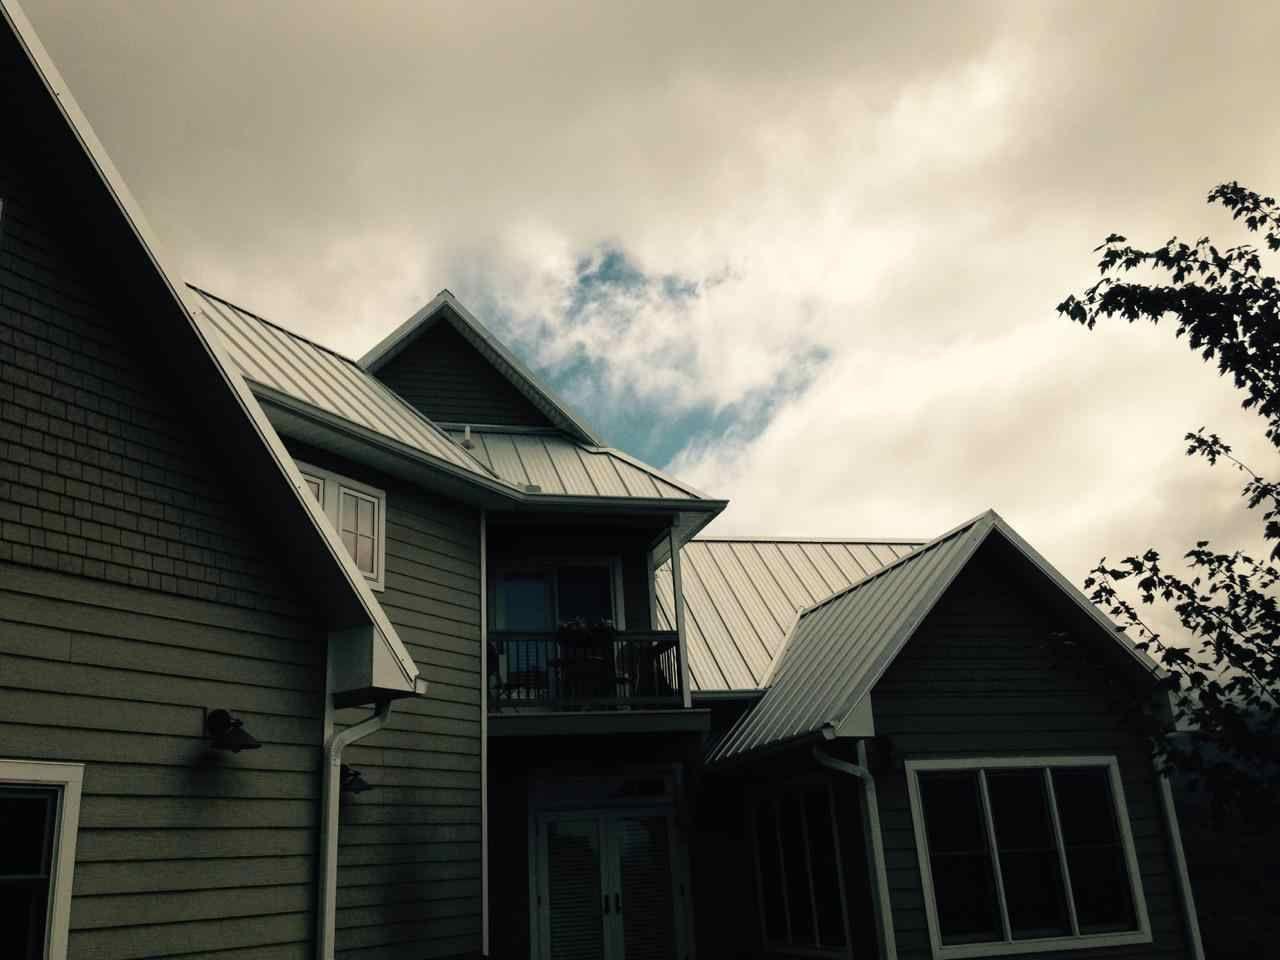 The Cool Roofing Company 1050 Key rd Atlanta Ga 30316 (404